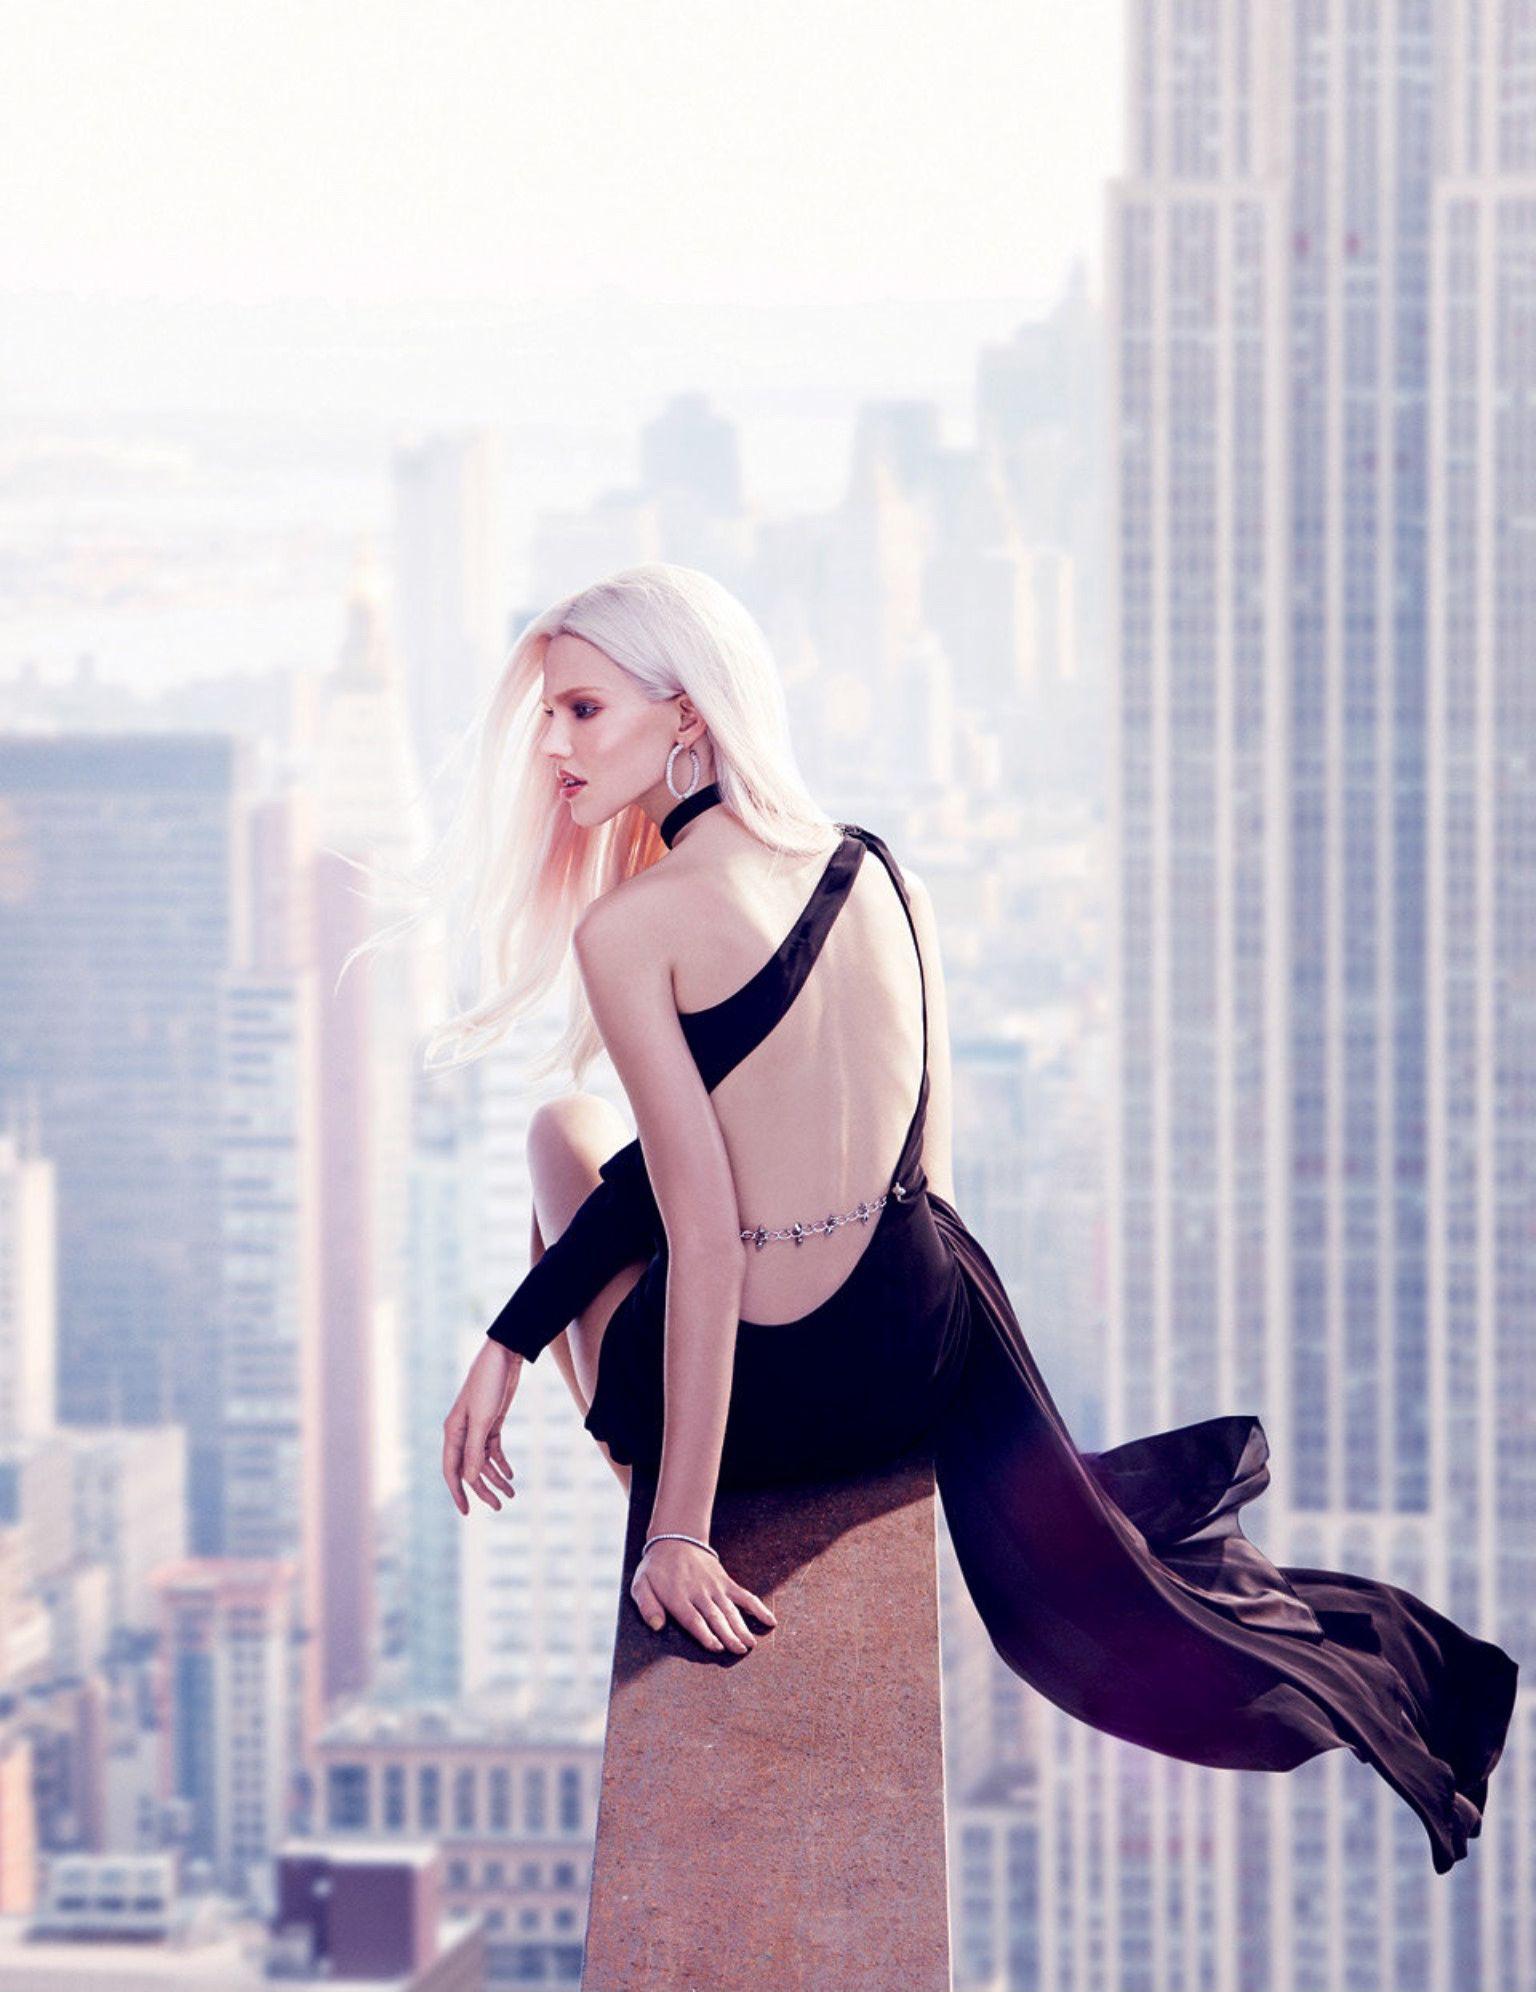 ☆ Sasha Luss   Photography by Alexi Lubomirski   For Vogue Magazine Russia   December 2015 ☆ #Sasha_Luss #Alexi_Lubomirski #Vogue #2015